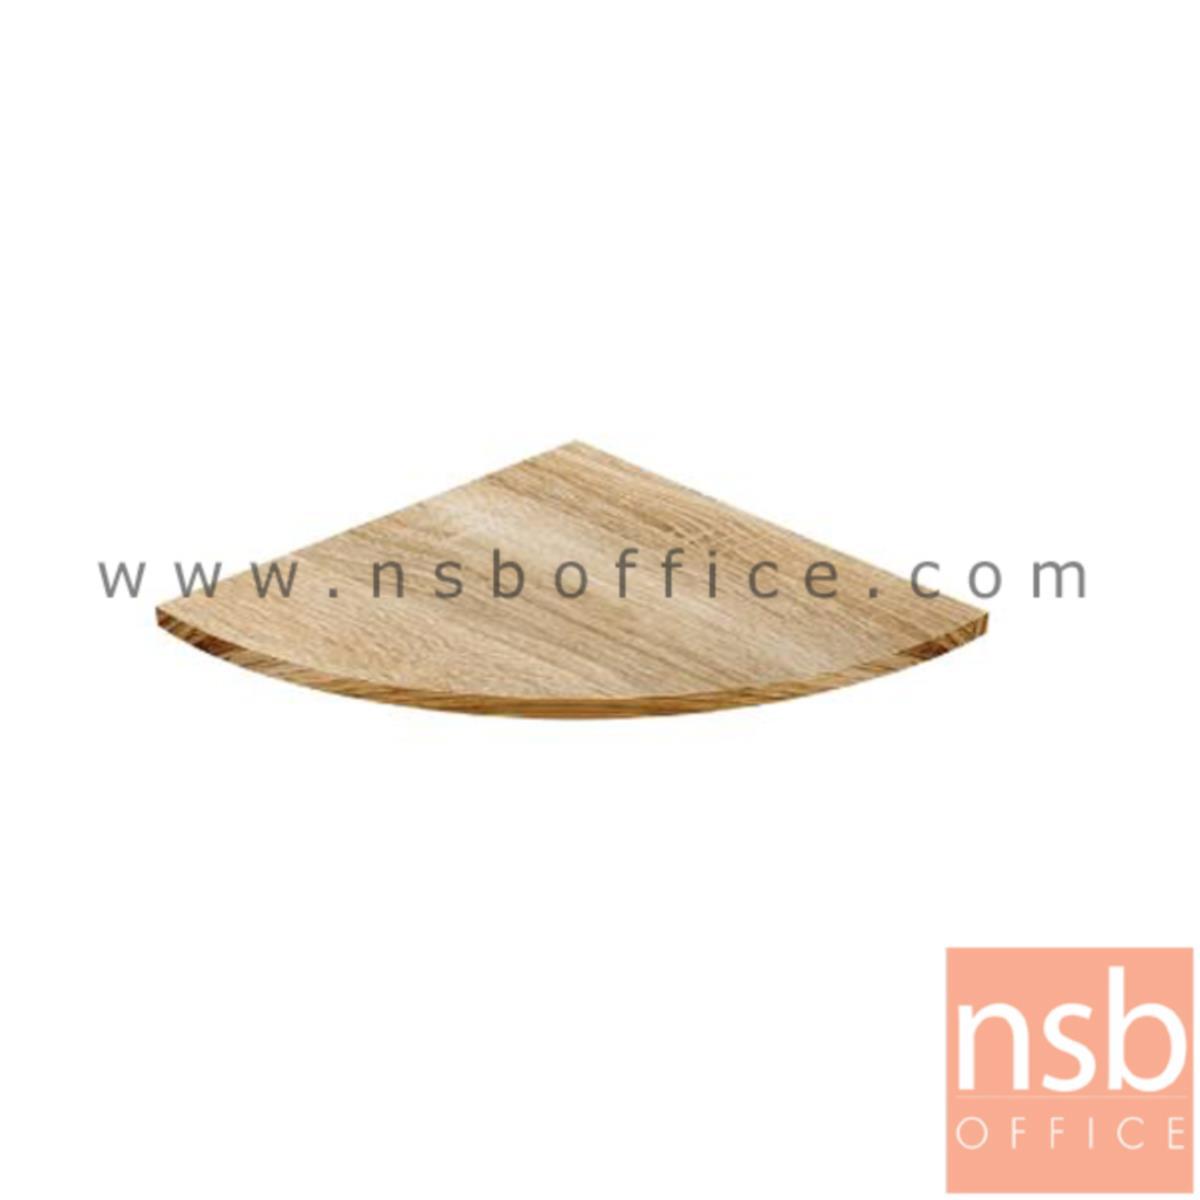 A21A015:แผ่นไม้ต่อหน้าโต๊ะเข้ามุม  รุ่น Globe (โกล์บ) ขนาด 60W*2.5H cm. สีเนเจอร์ทีค-ขาว